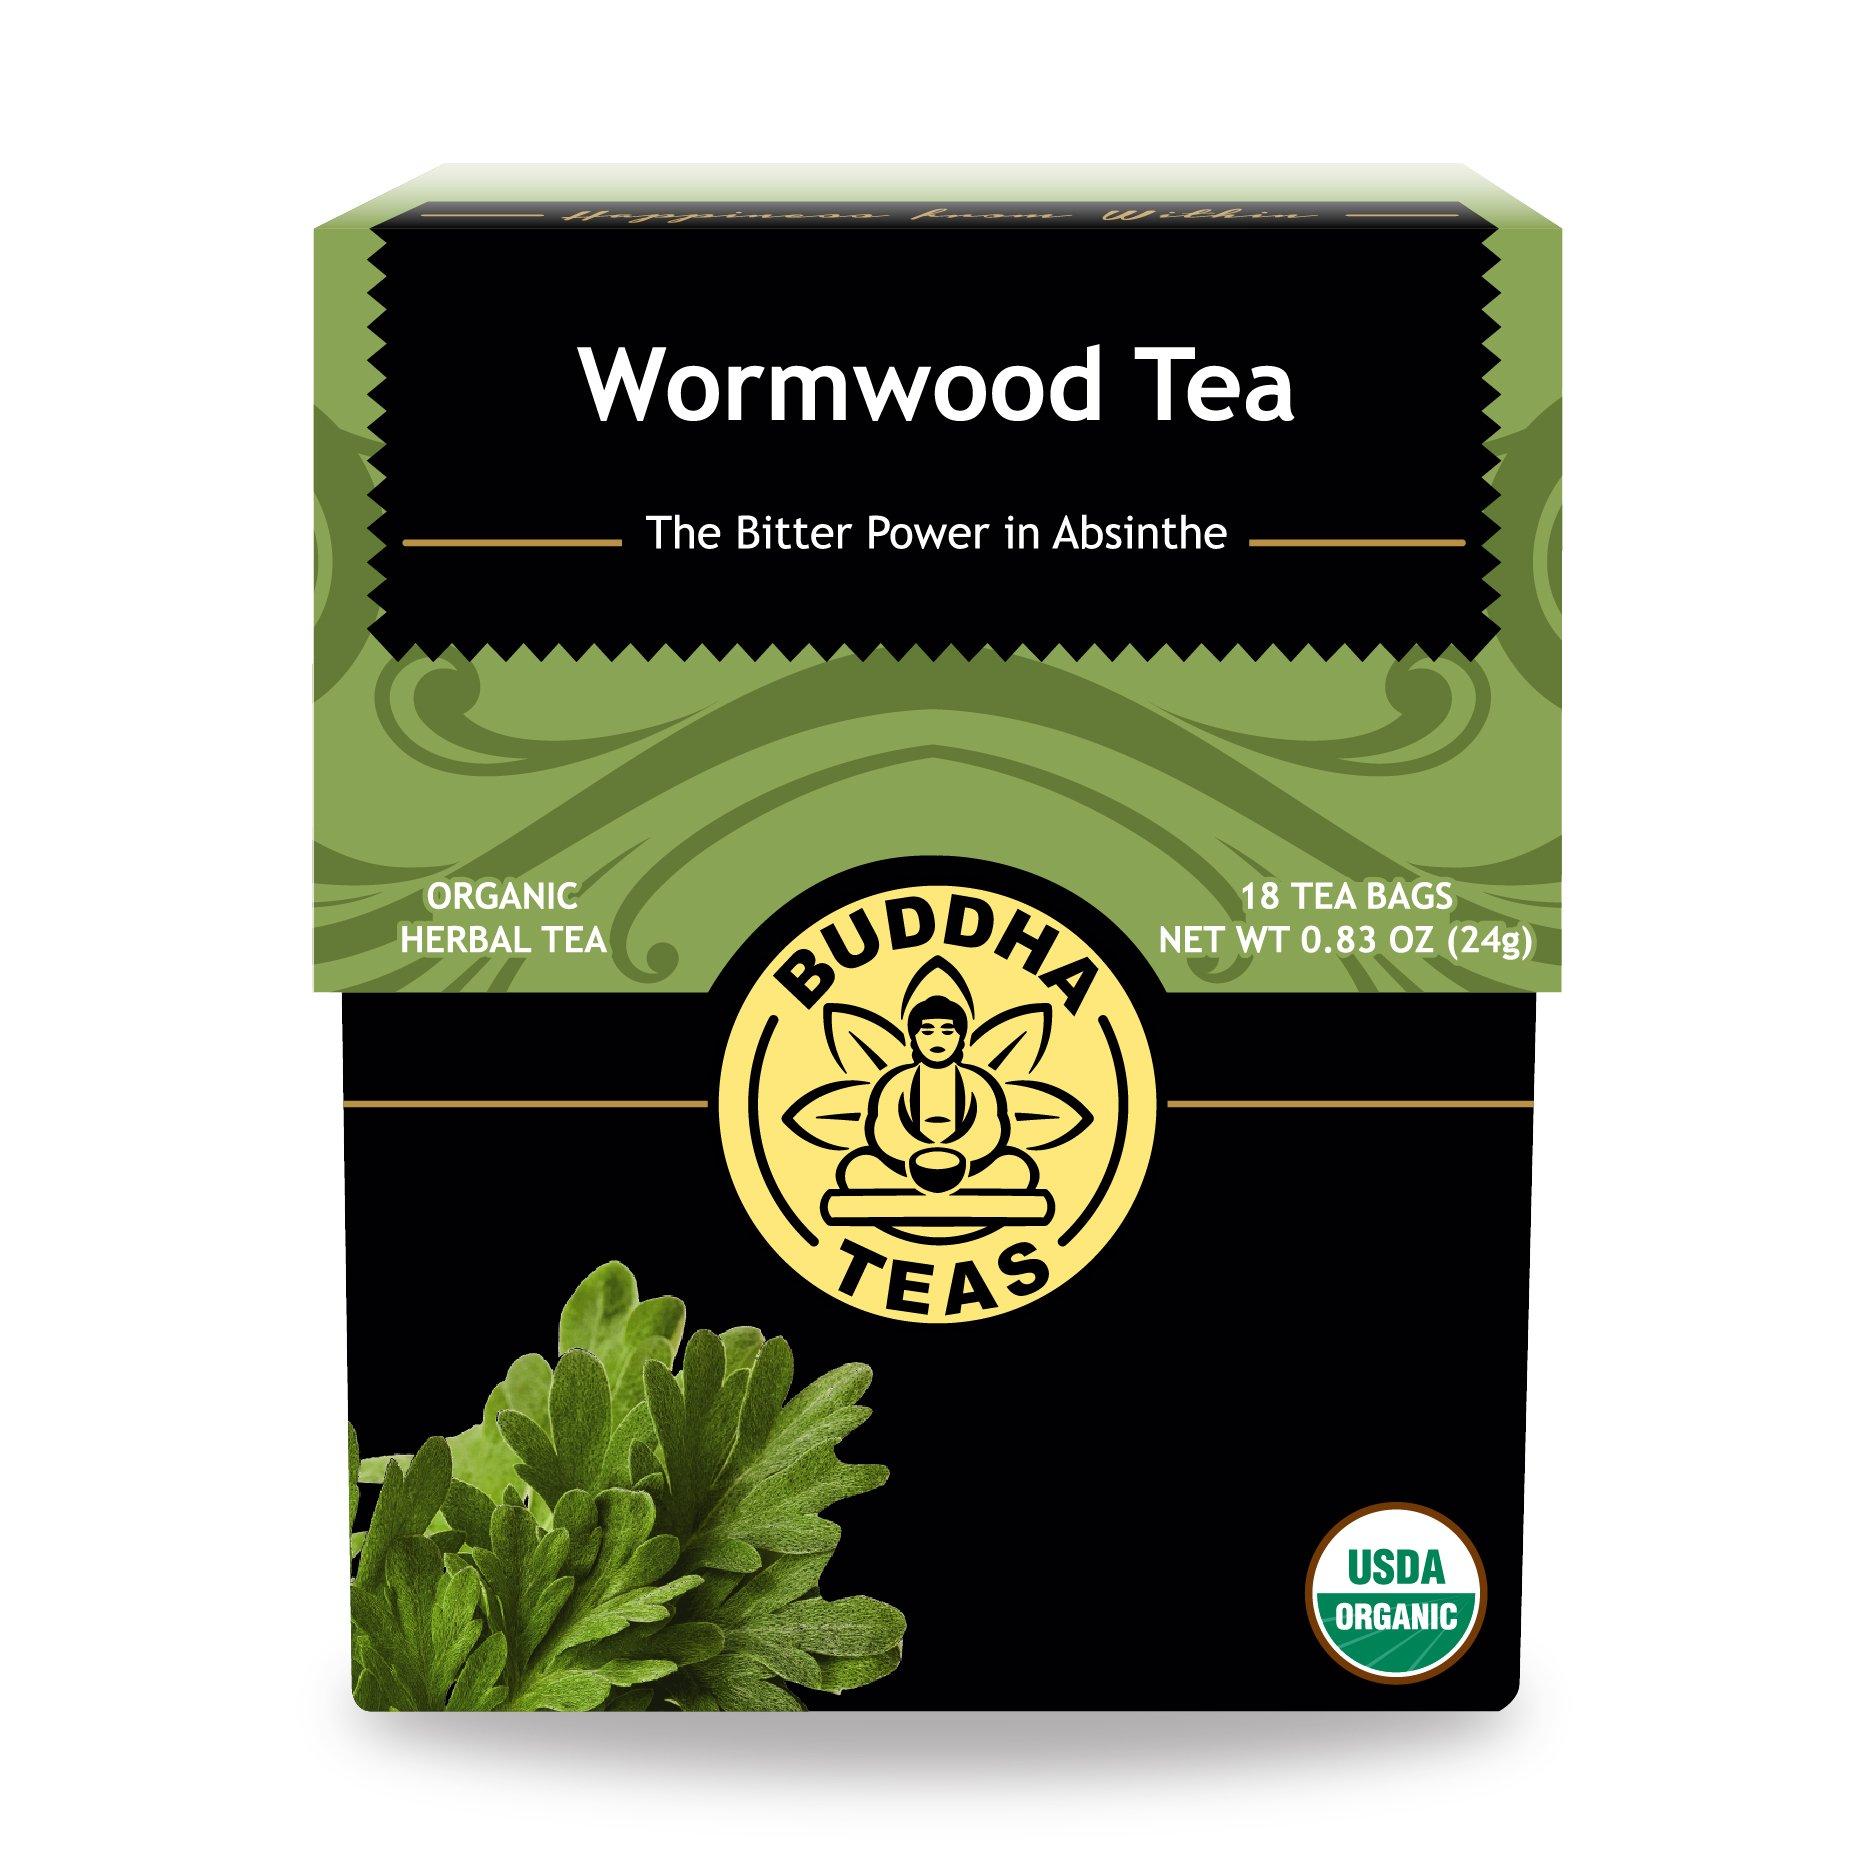 Organic Wormwood Tea, 18 Bleach-Free Tea Bags – Natural Source of Antioxidants, Vitamins C and B Complex, No GMOs